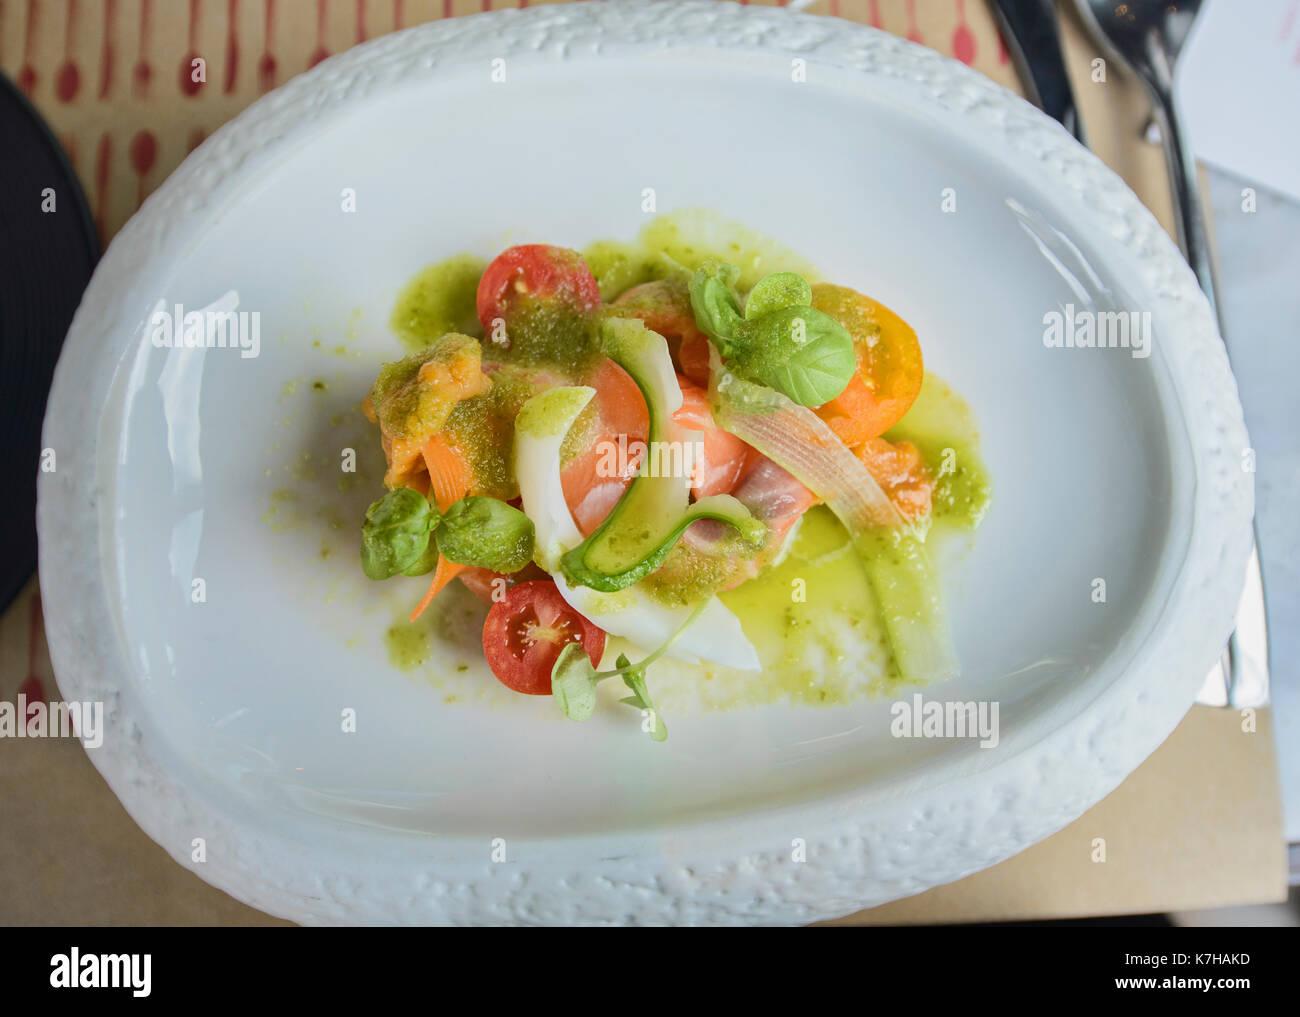 Gourmet cuisine, Bangkok, Thailand - Stock Image